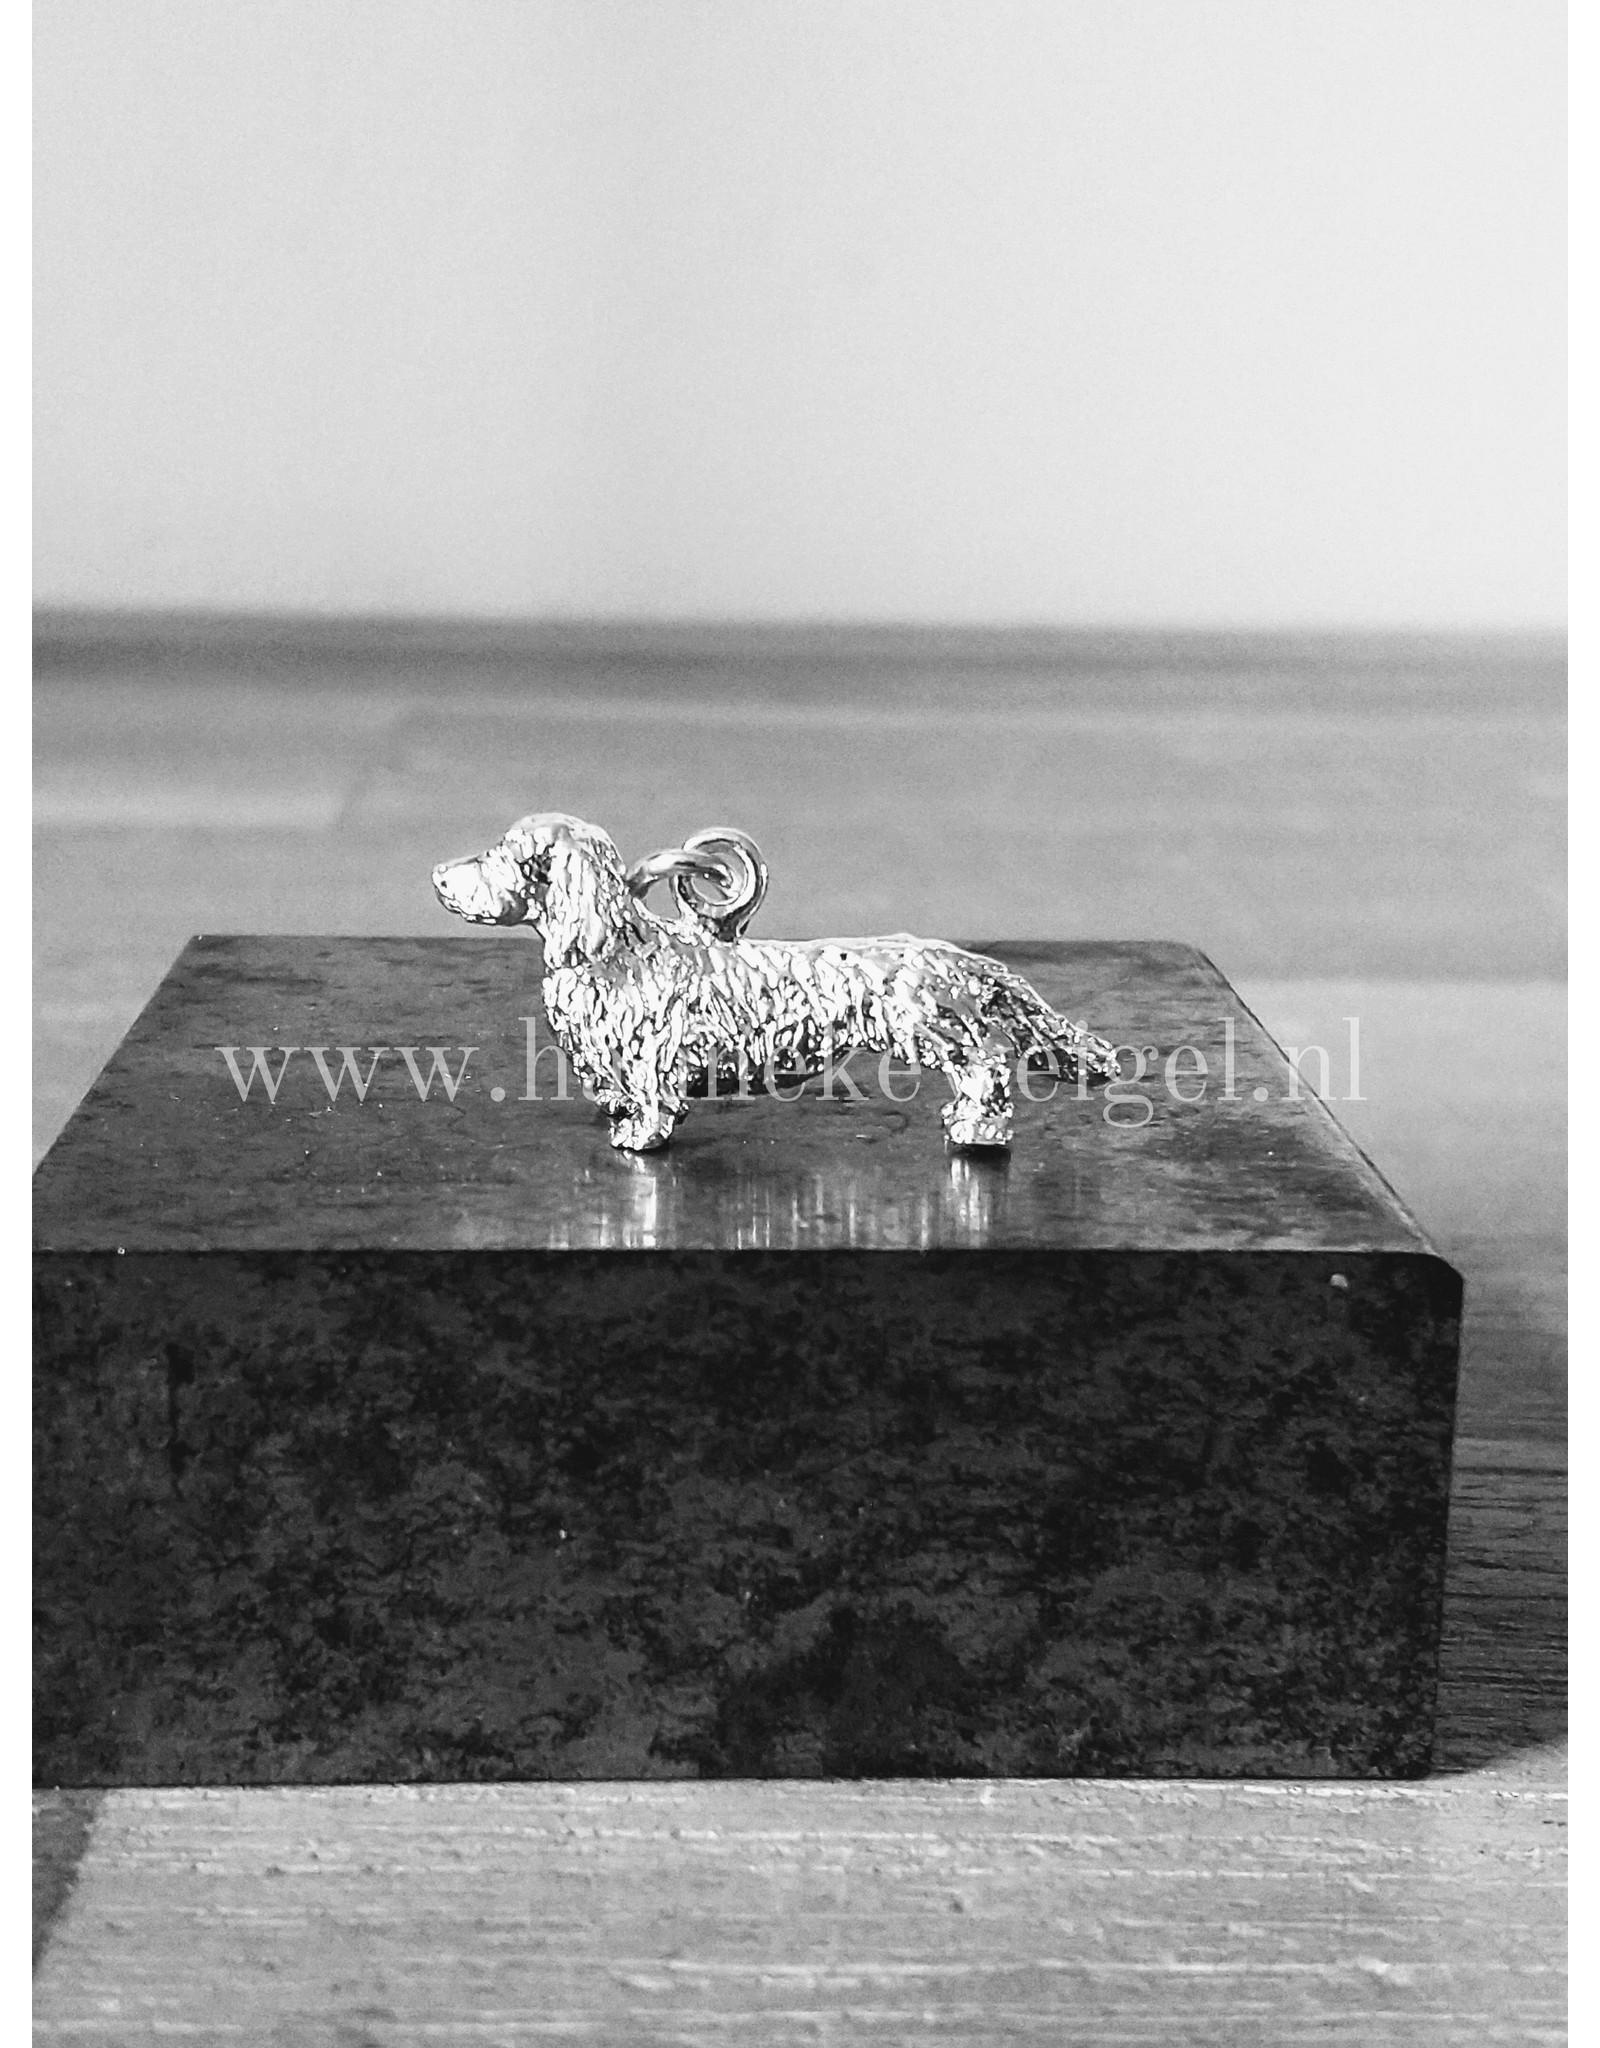 Handmade by Hanneke Weigel Zilveren teckel langhaar